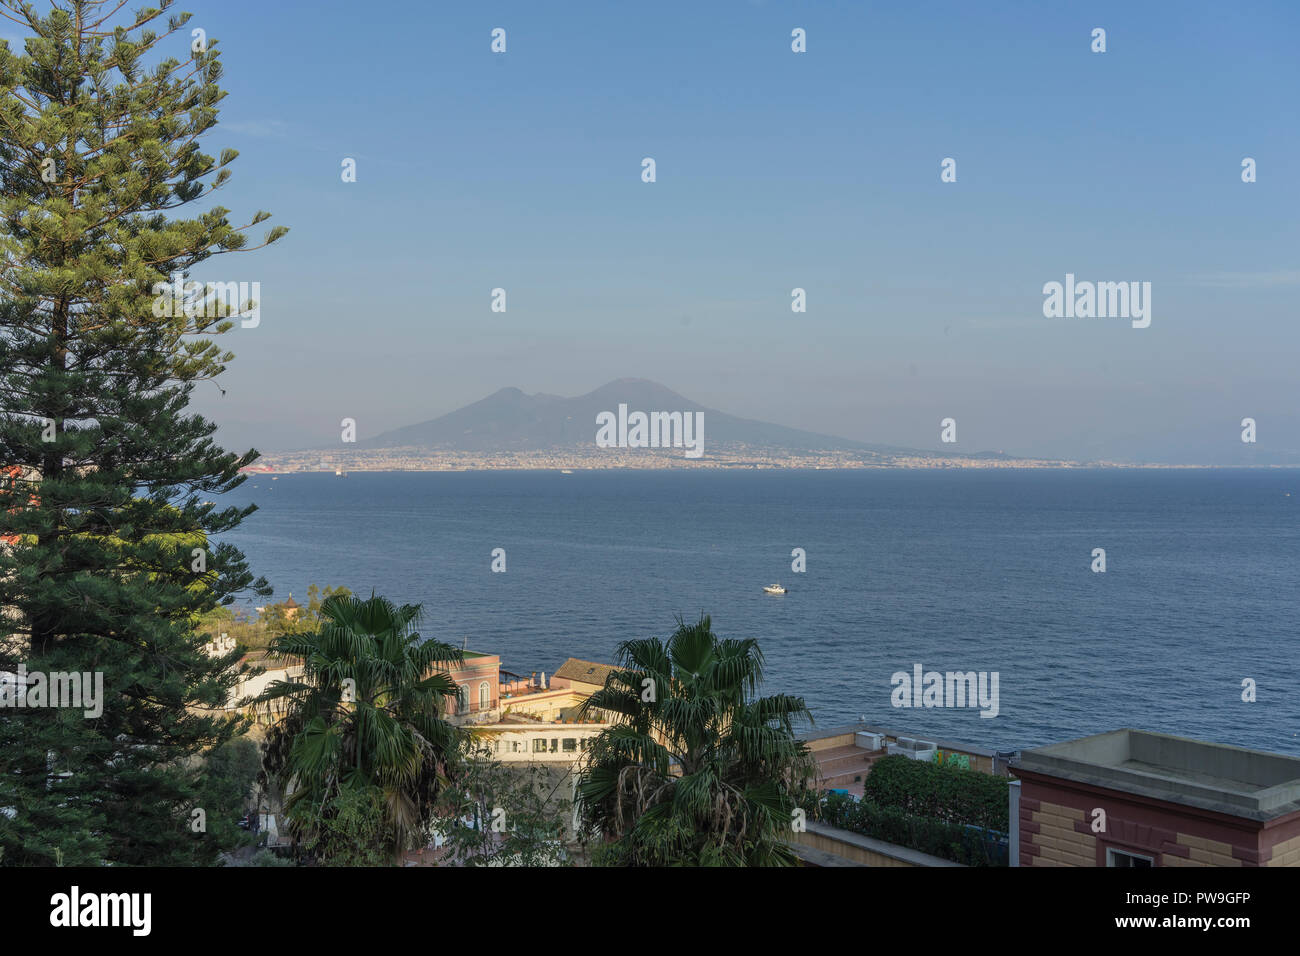 Gulf of Naples - Stock Image